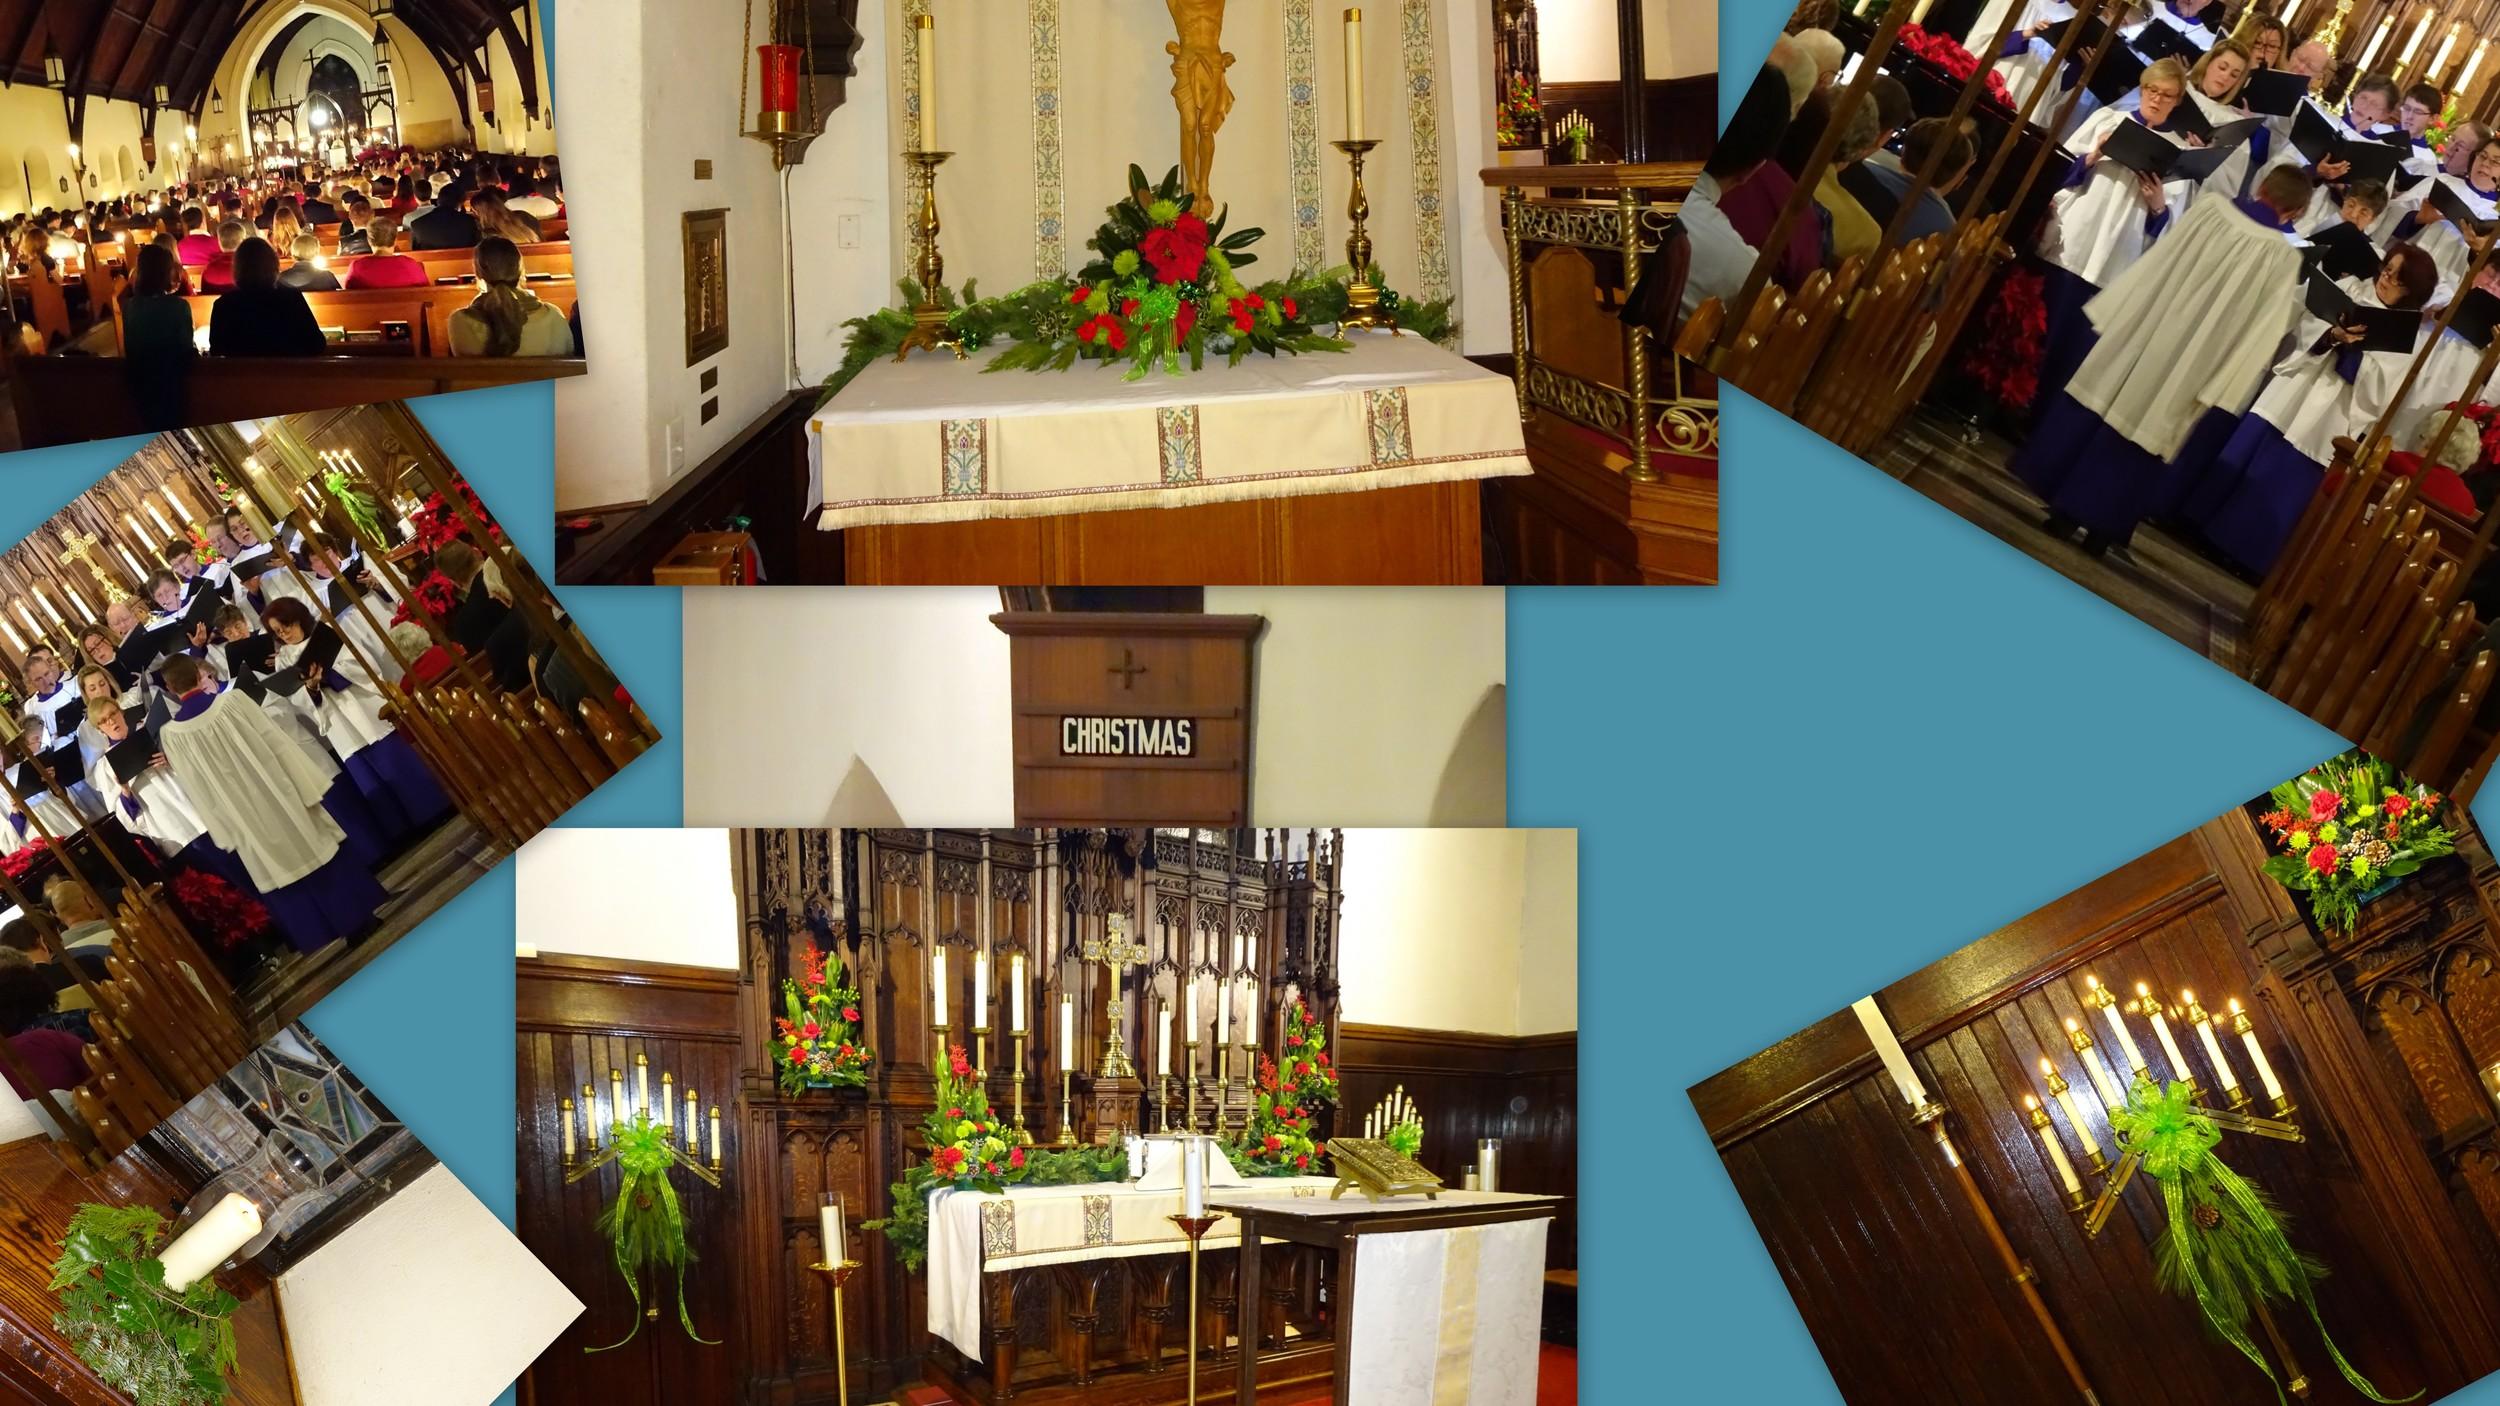 2014-12-24 Grace Church Christmas Eve 11pm Mass.jpg